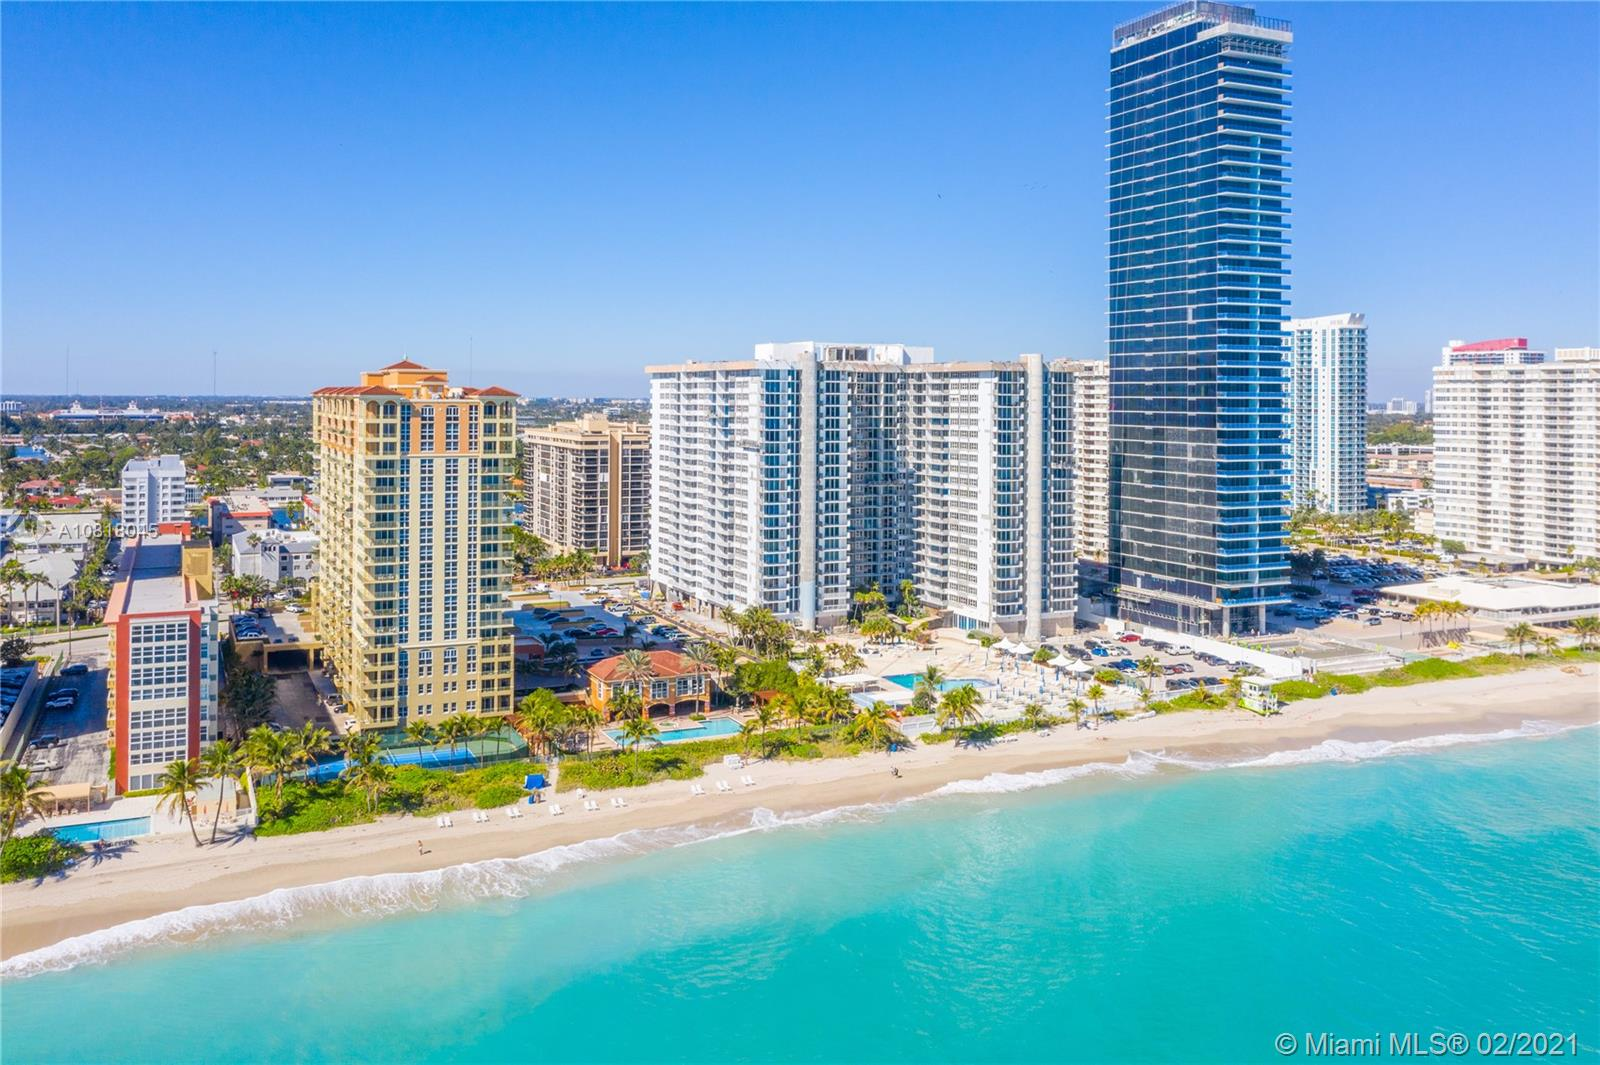 2080 Hallandale #407 - 2080 S Ocean Dr #407, Hallandale Beach, FL 33009